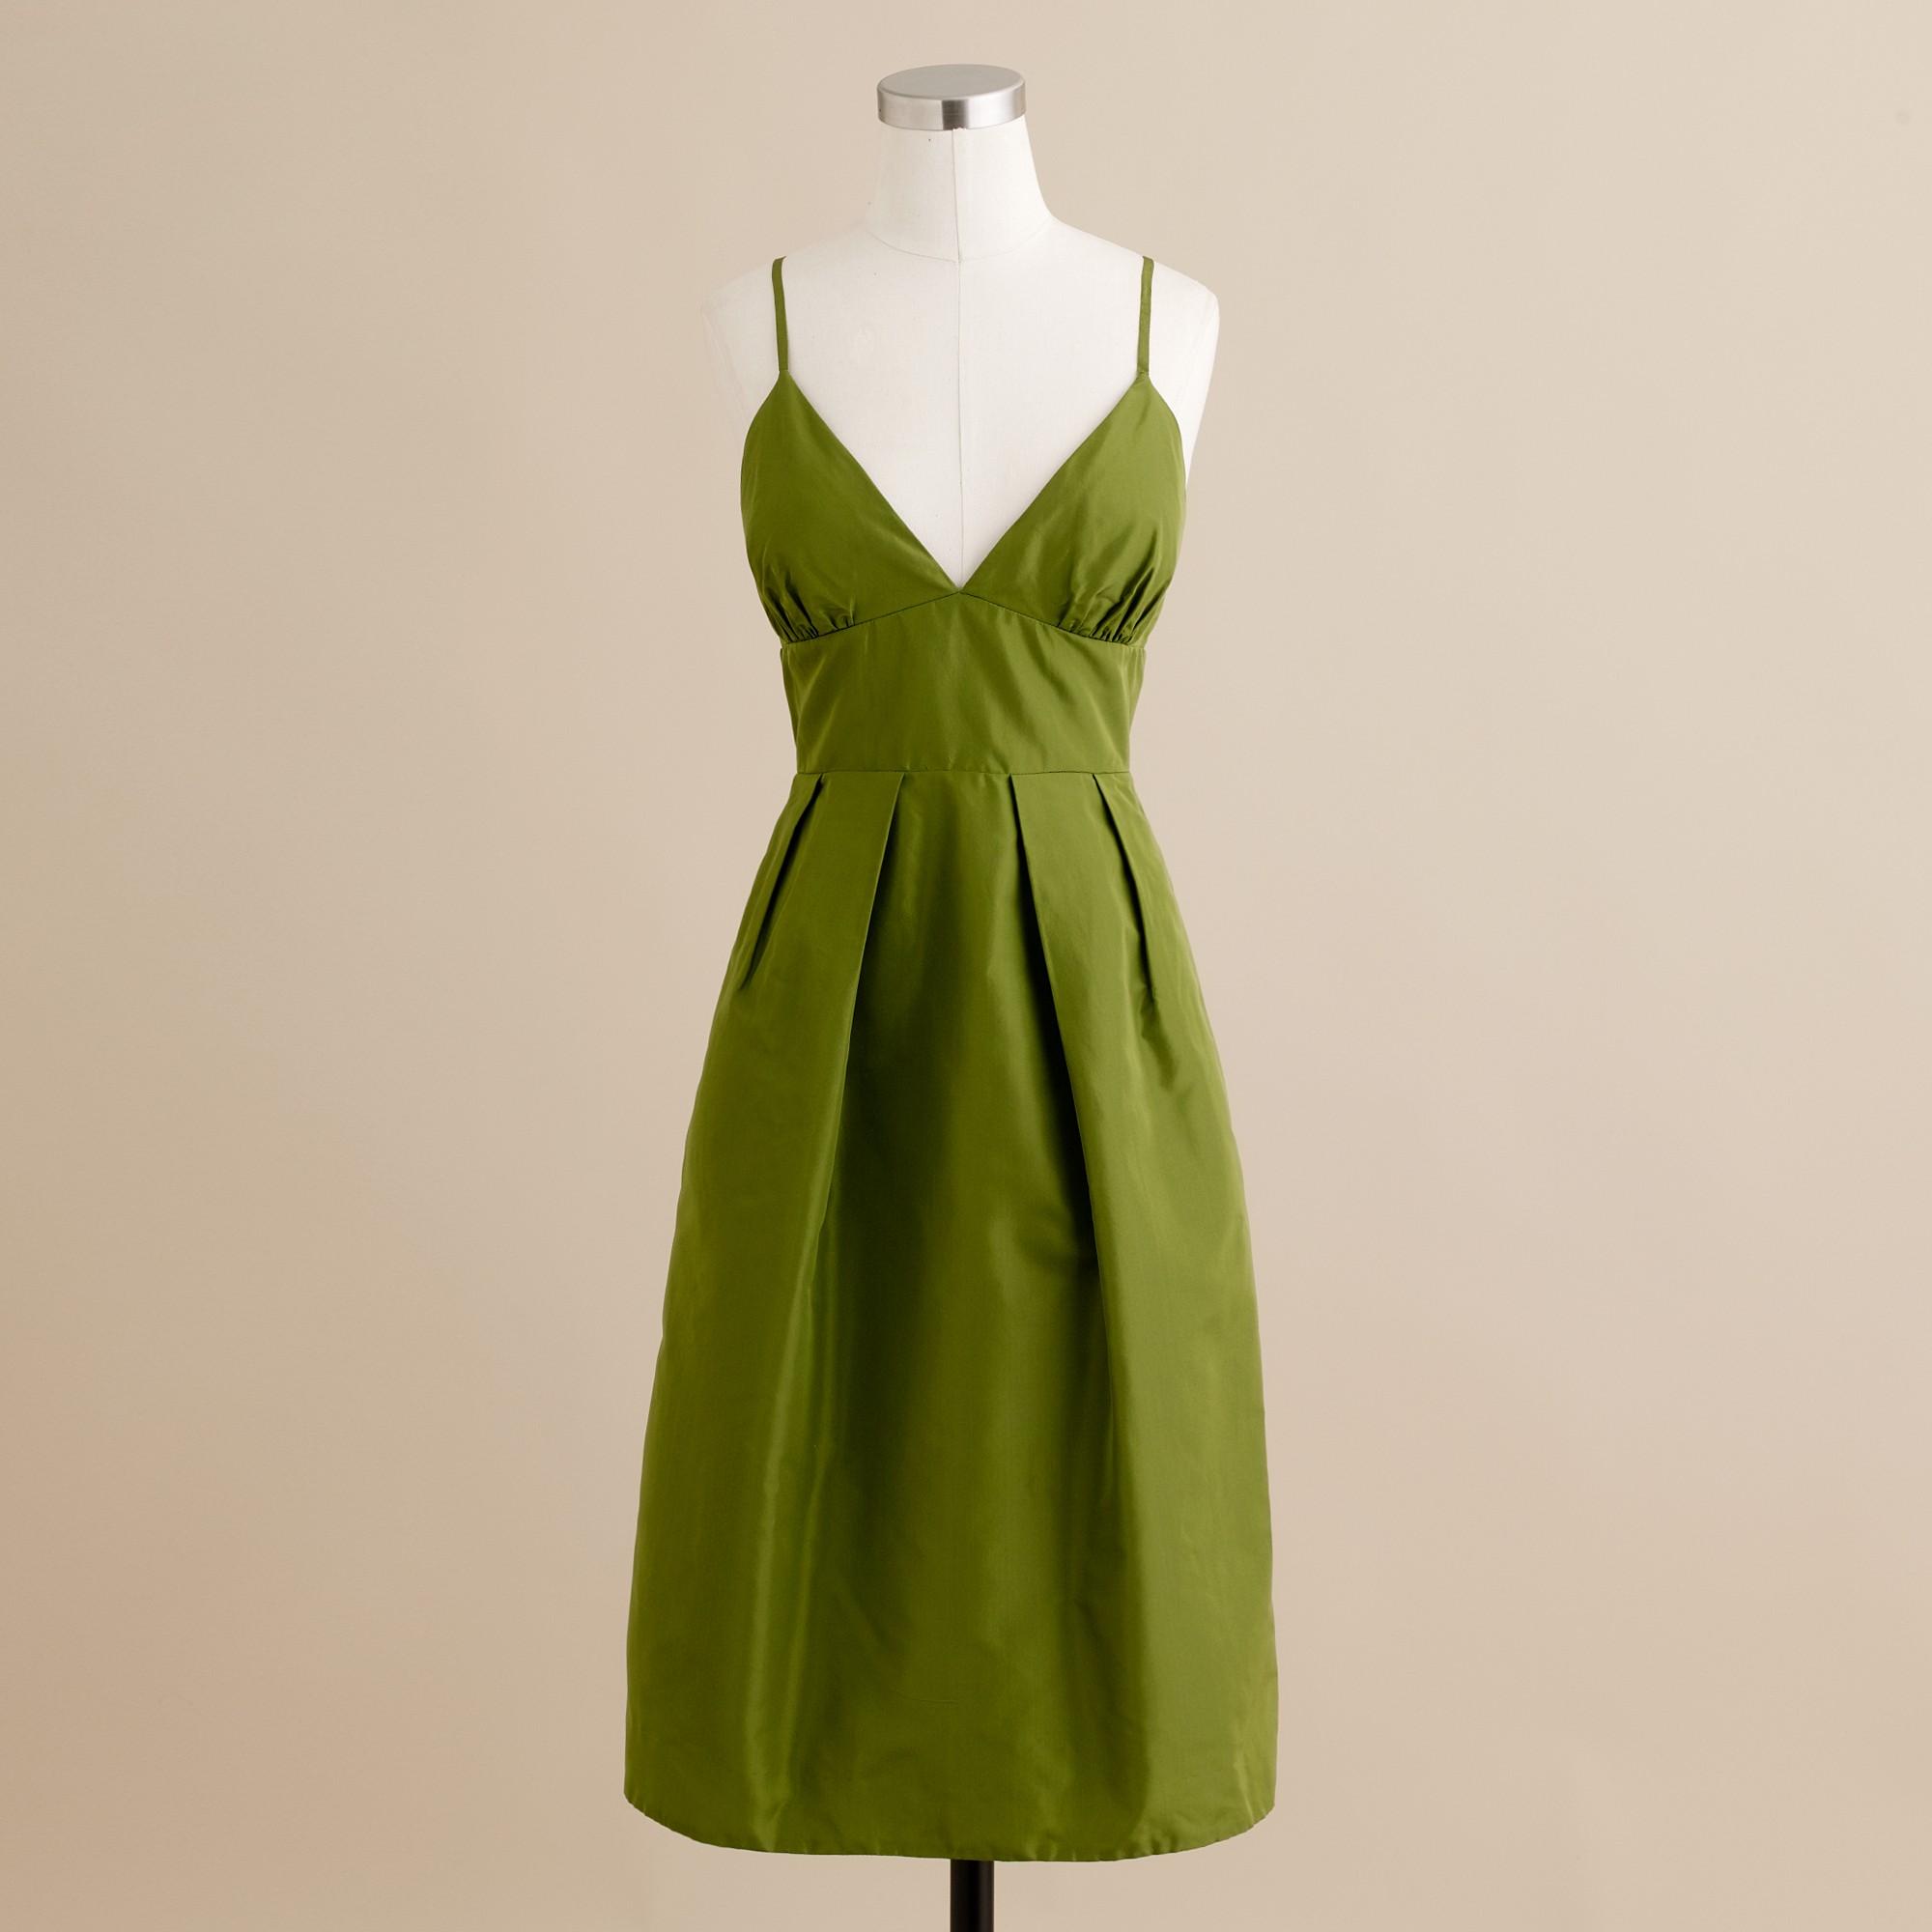 Adrienne Dress In Silk Taffeta: J.Crew Adrienne Dress In Silk Taffeta In Green